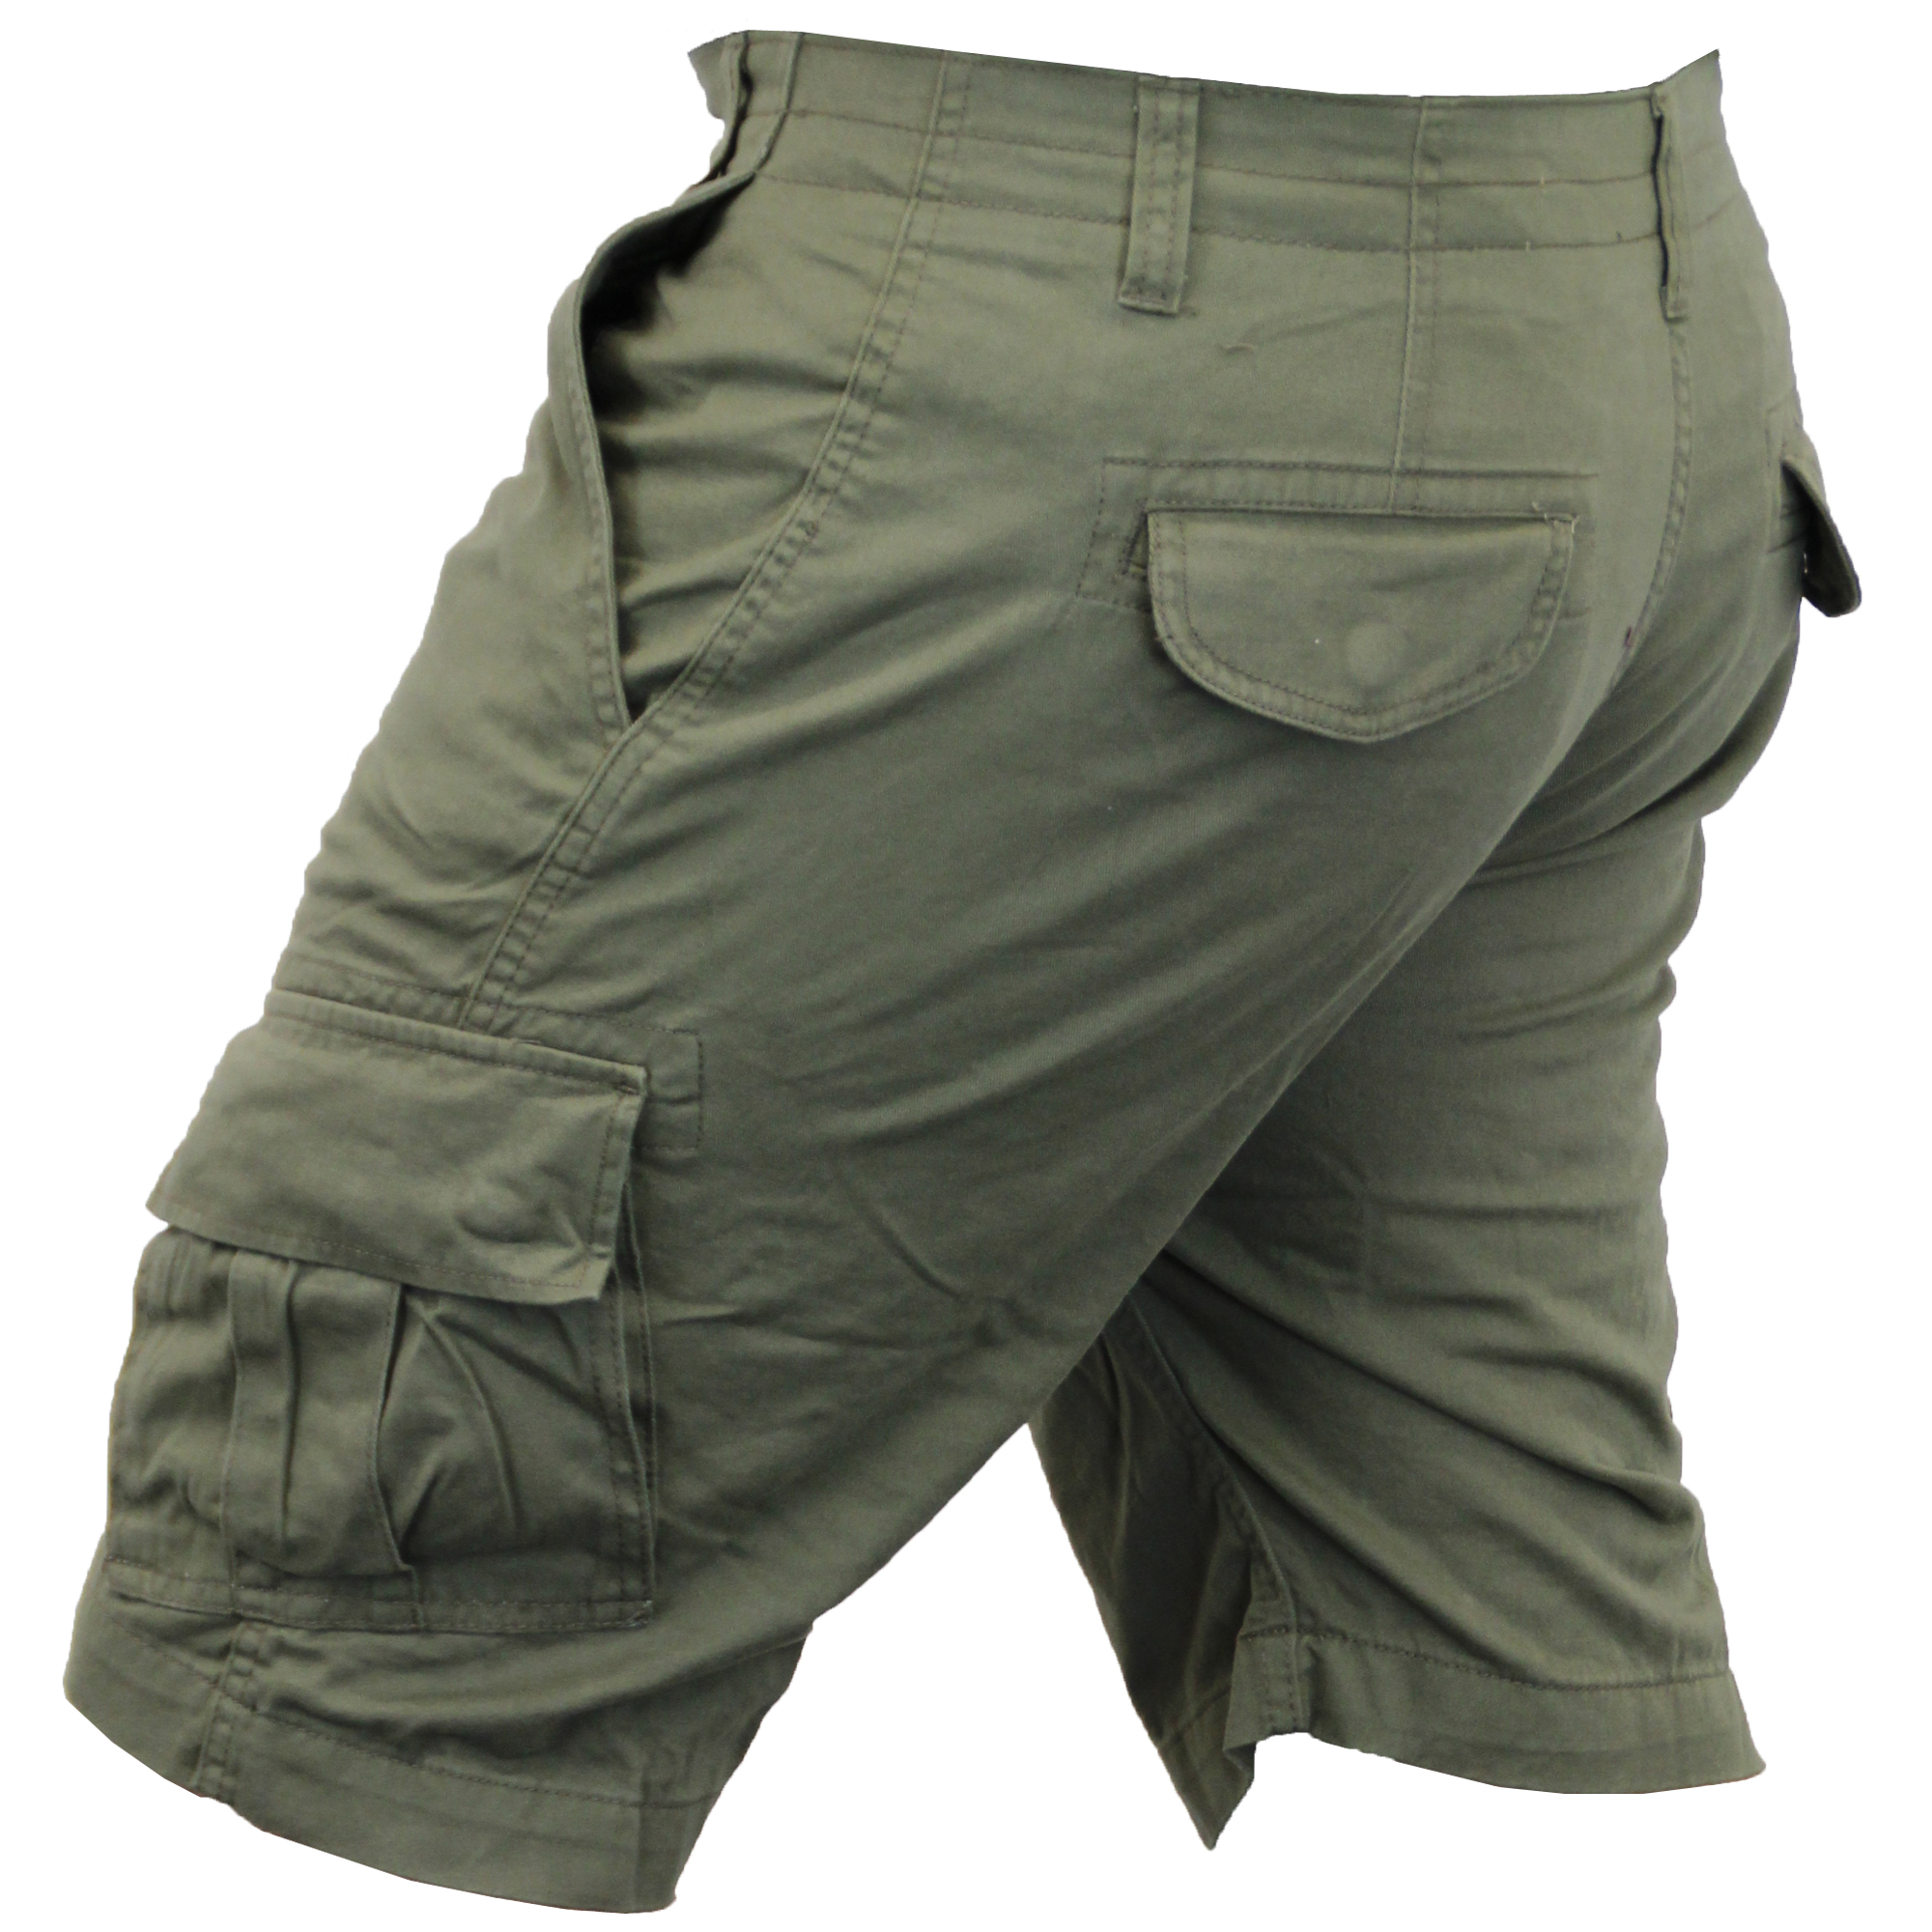 Mens-Cargo-Chino-Shorts-Threadbare-Combat-Knee-Length-Westace-Military-Summer thumbnail 18